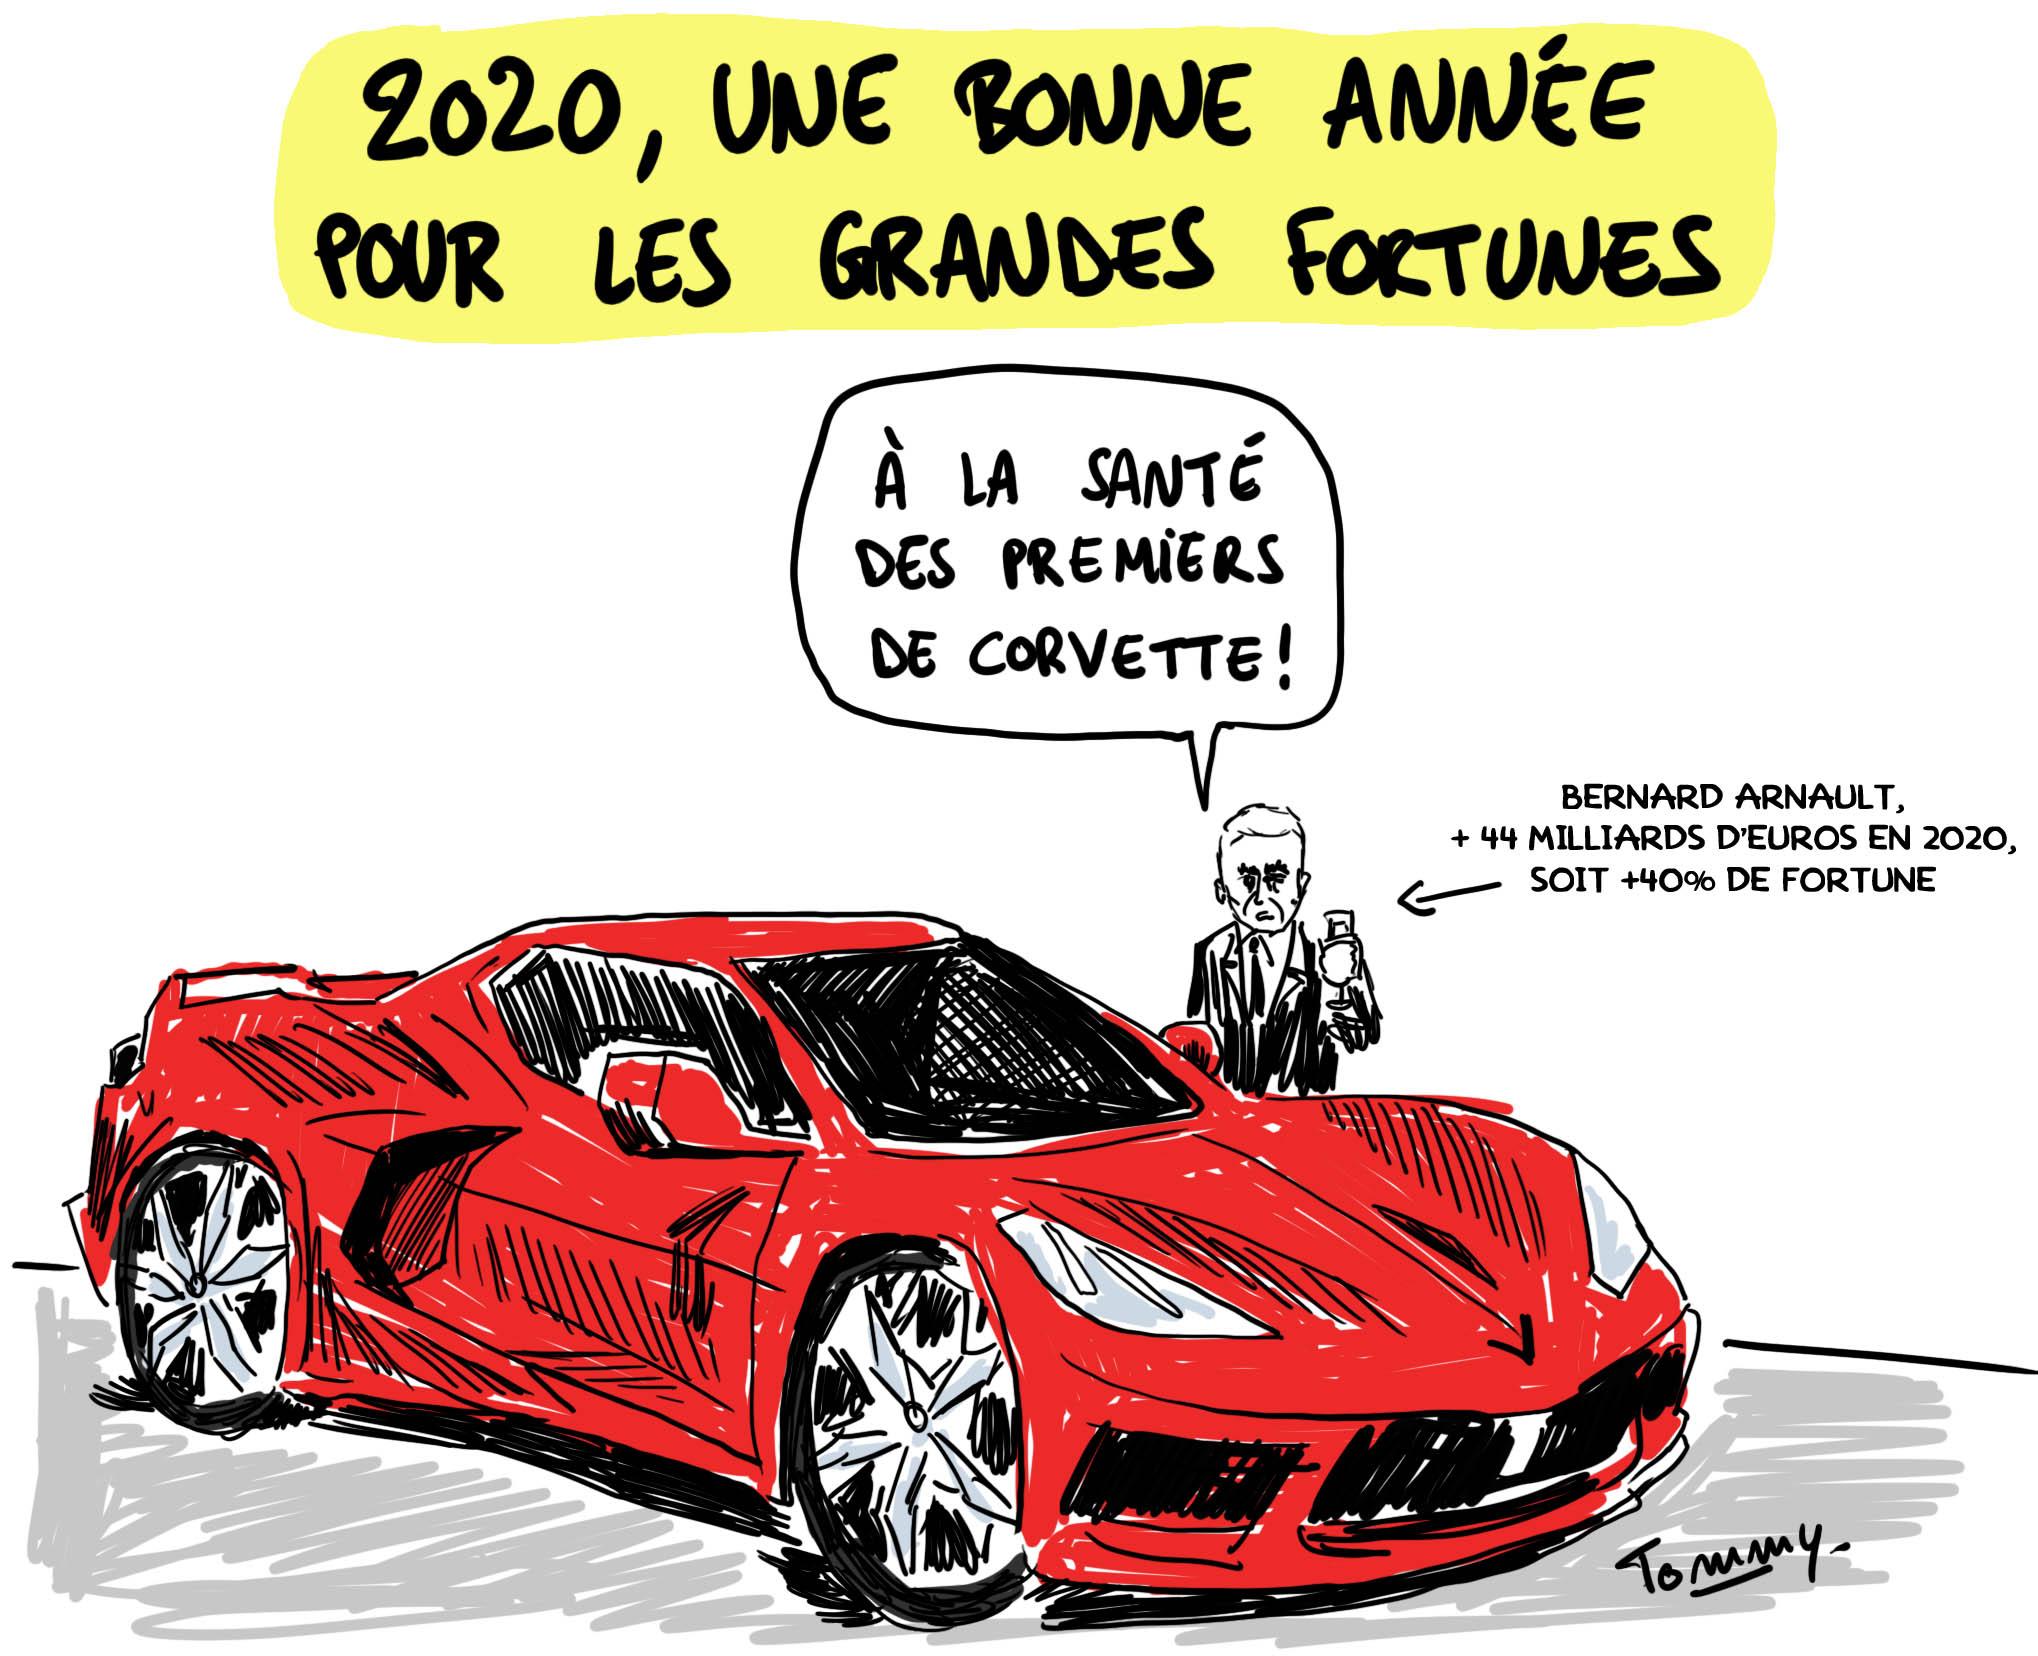 Grandes fortunes 2020